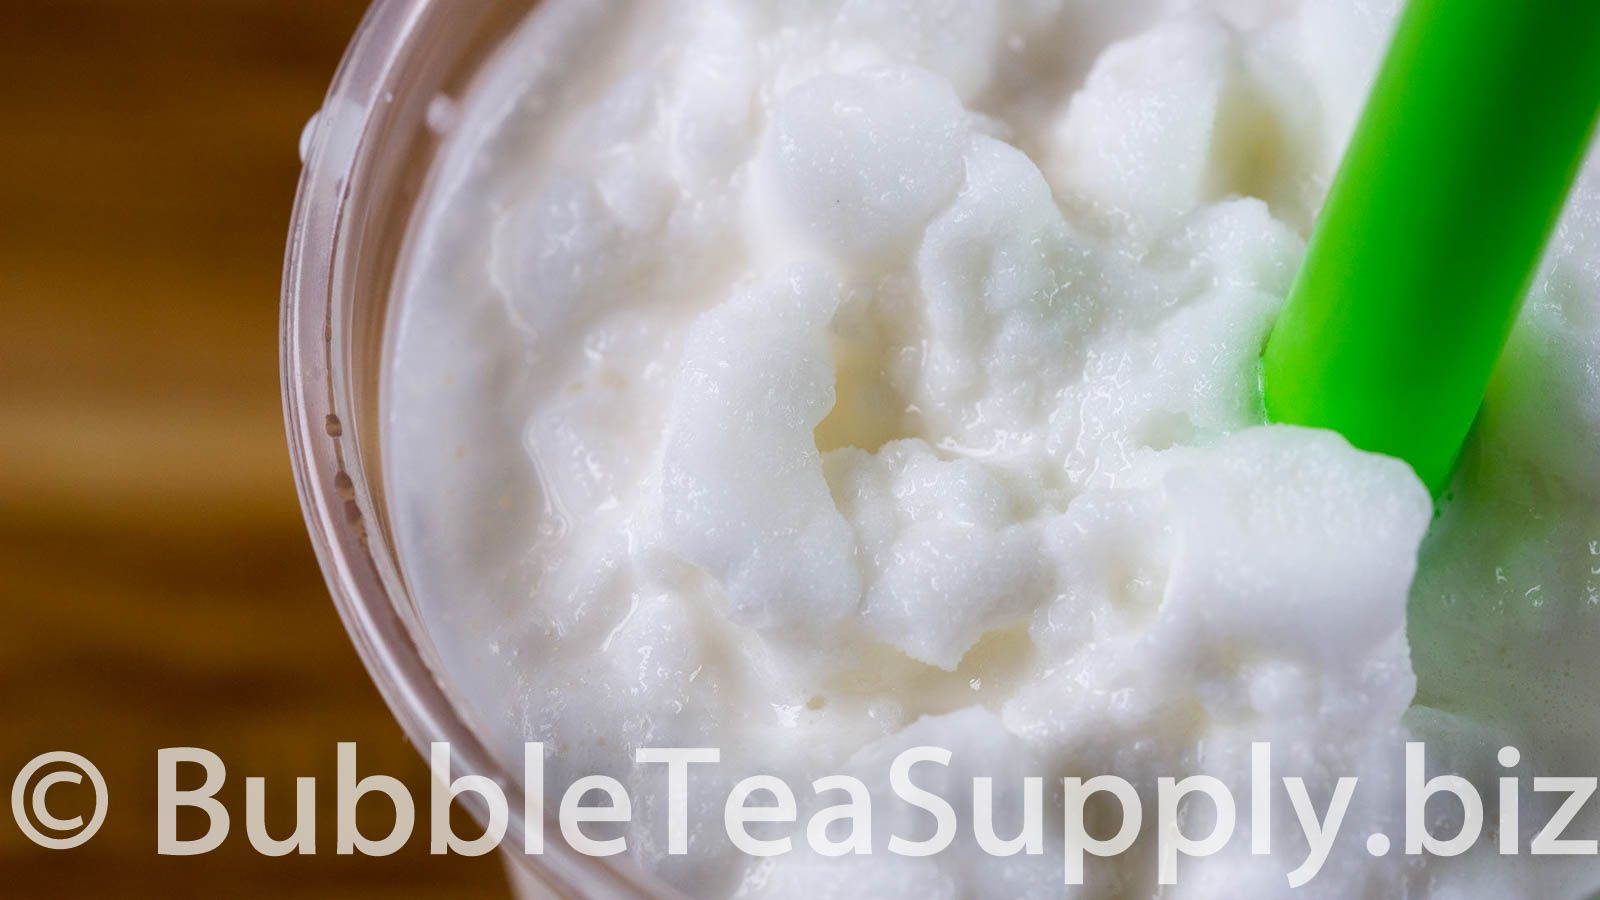 how to make coconut bubble tea with boba tapioca pearls bubble tea supply blog recipe coconut bubble tea recipe boba tea recipe bubble tea how to make coconut bubble tea with boba tapioca pearls